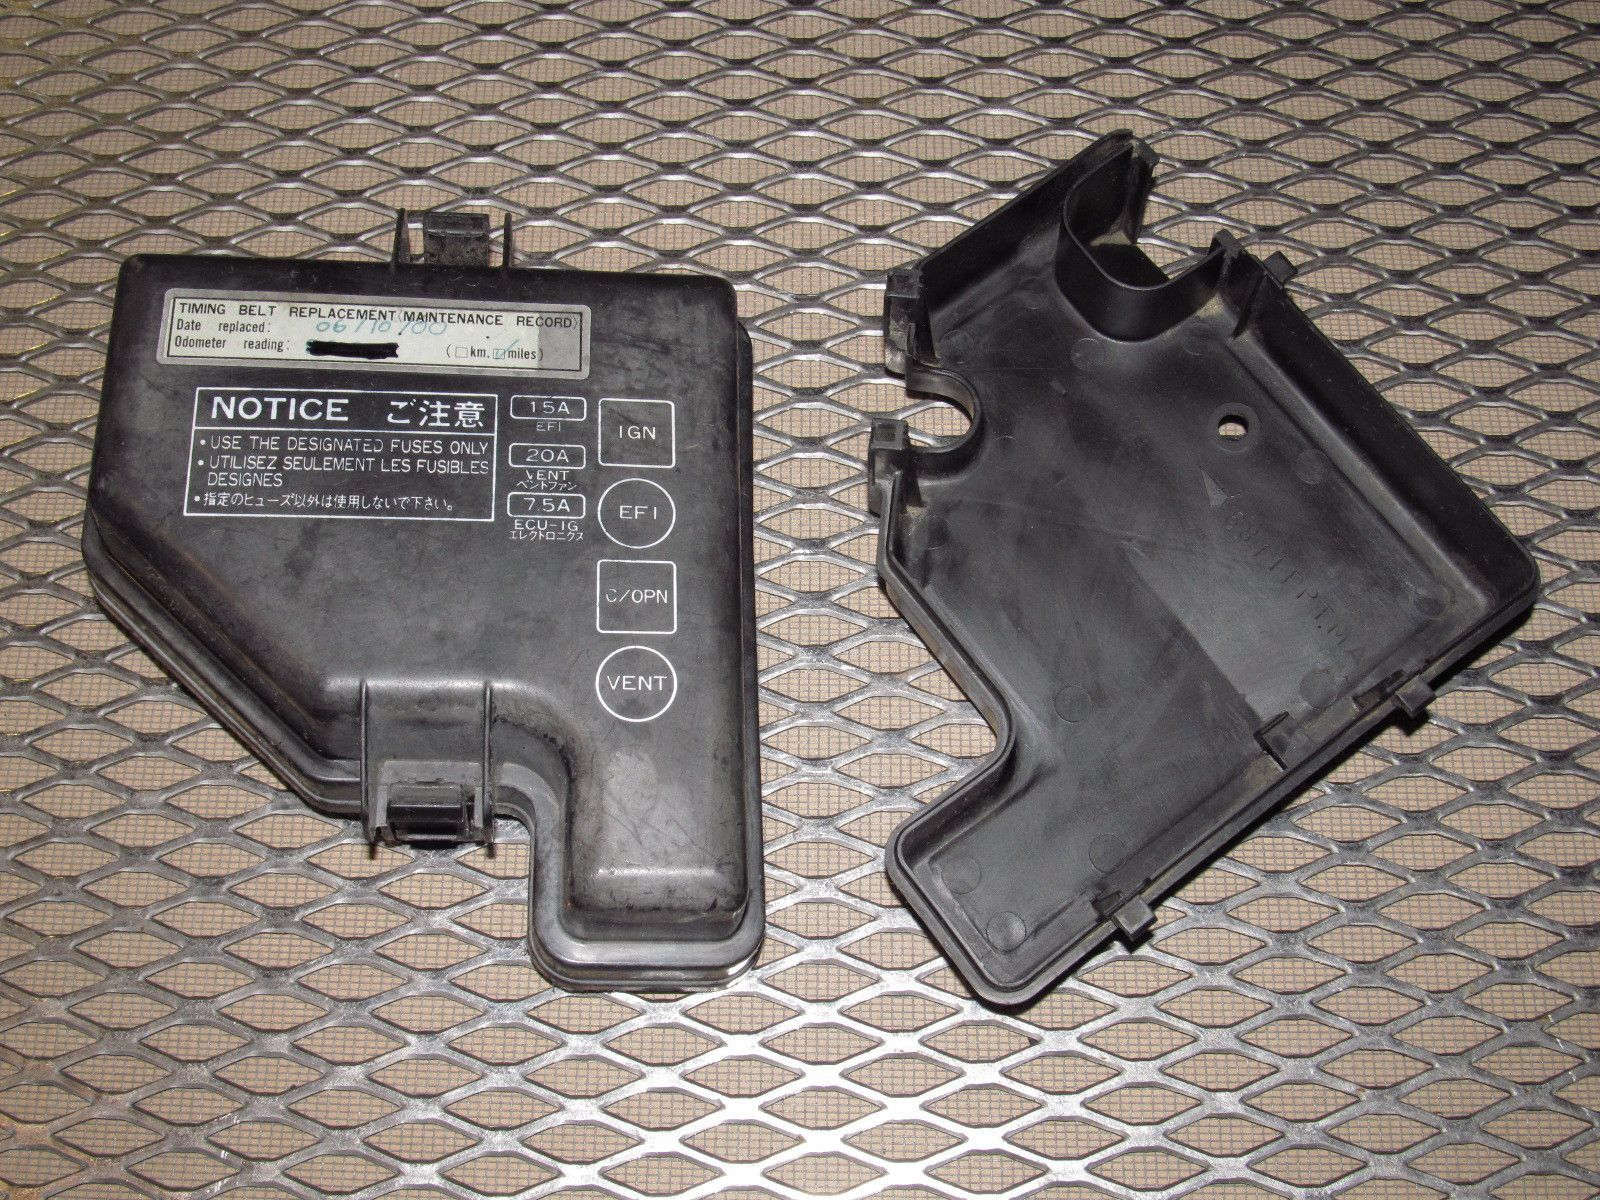 3sgte fuse box electrical wiring diagrams 1991 toyota mr2 fuse box wiring uk [ 1600 x 1200 Pixel ]